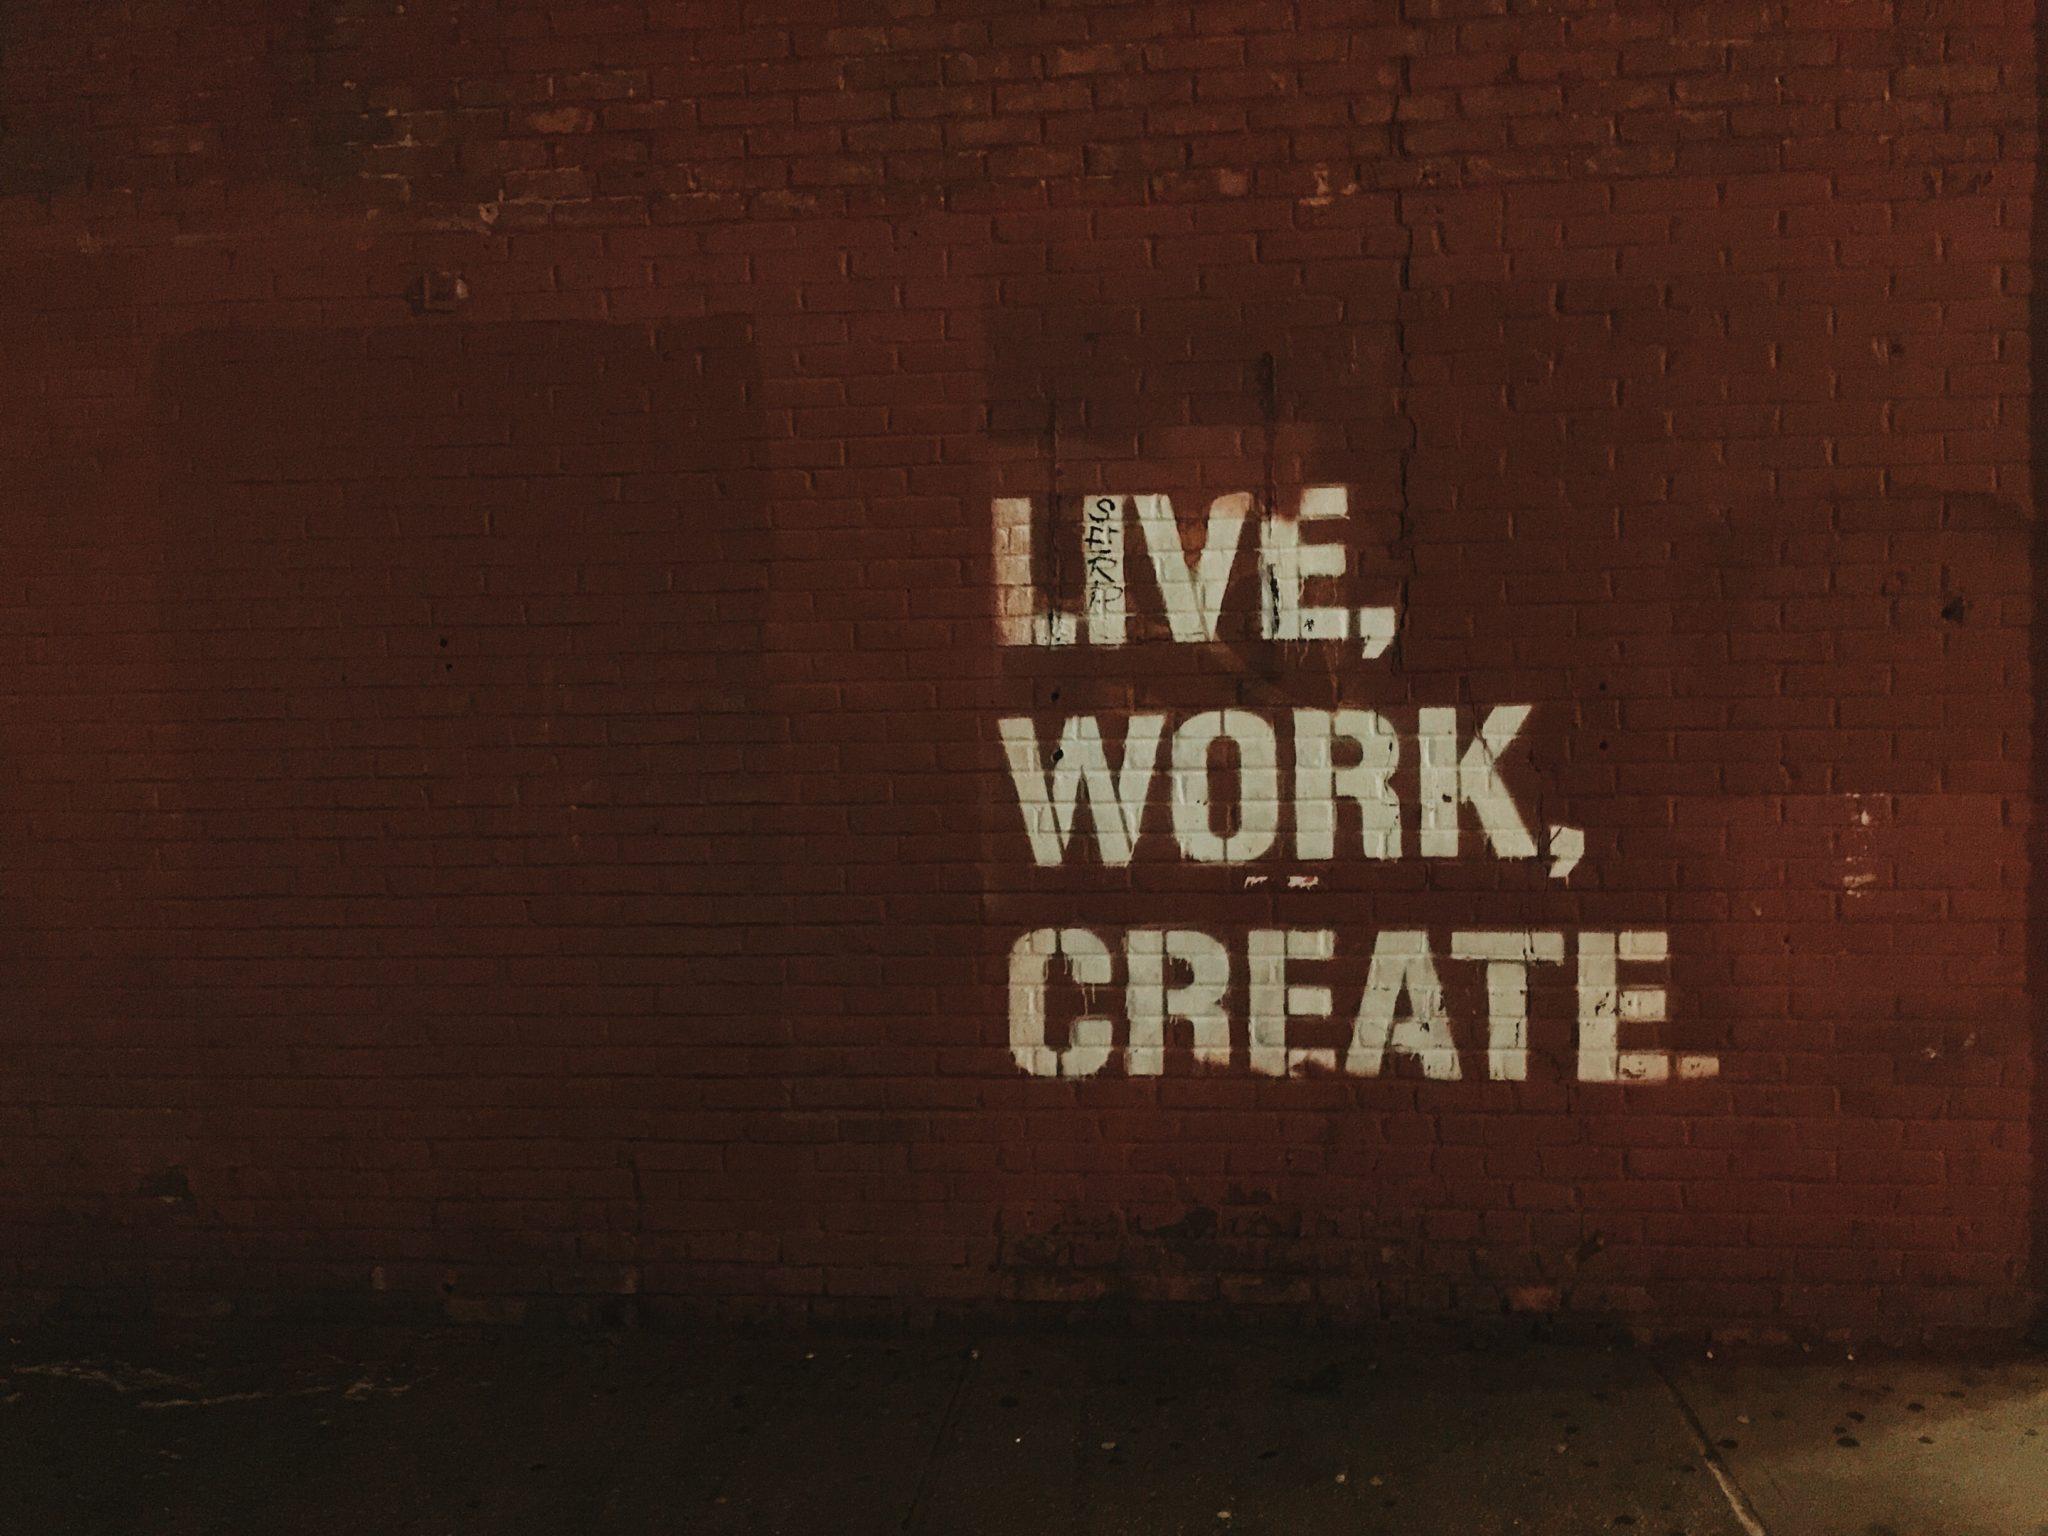 Image of live, work, create